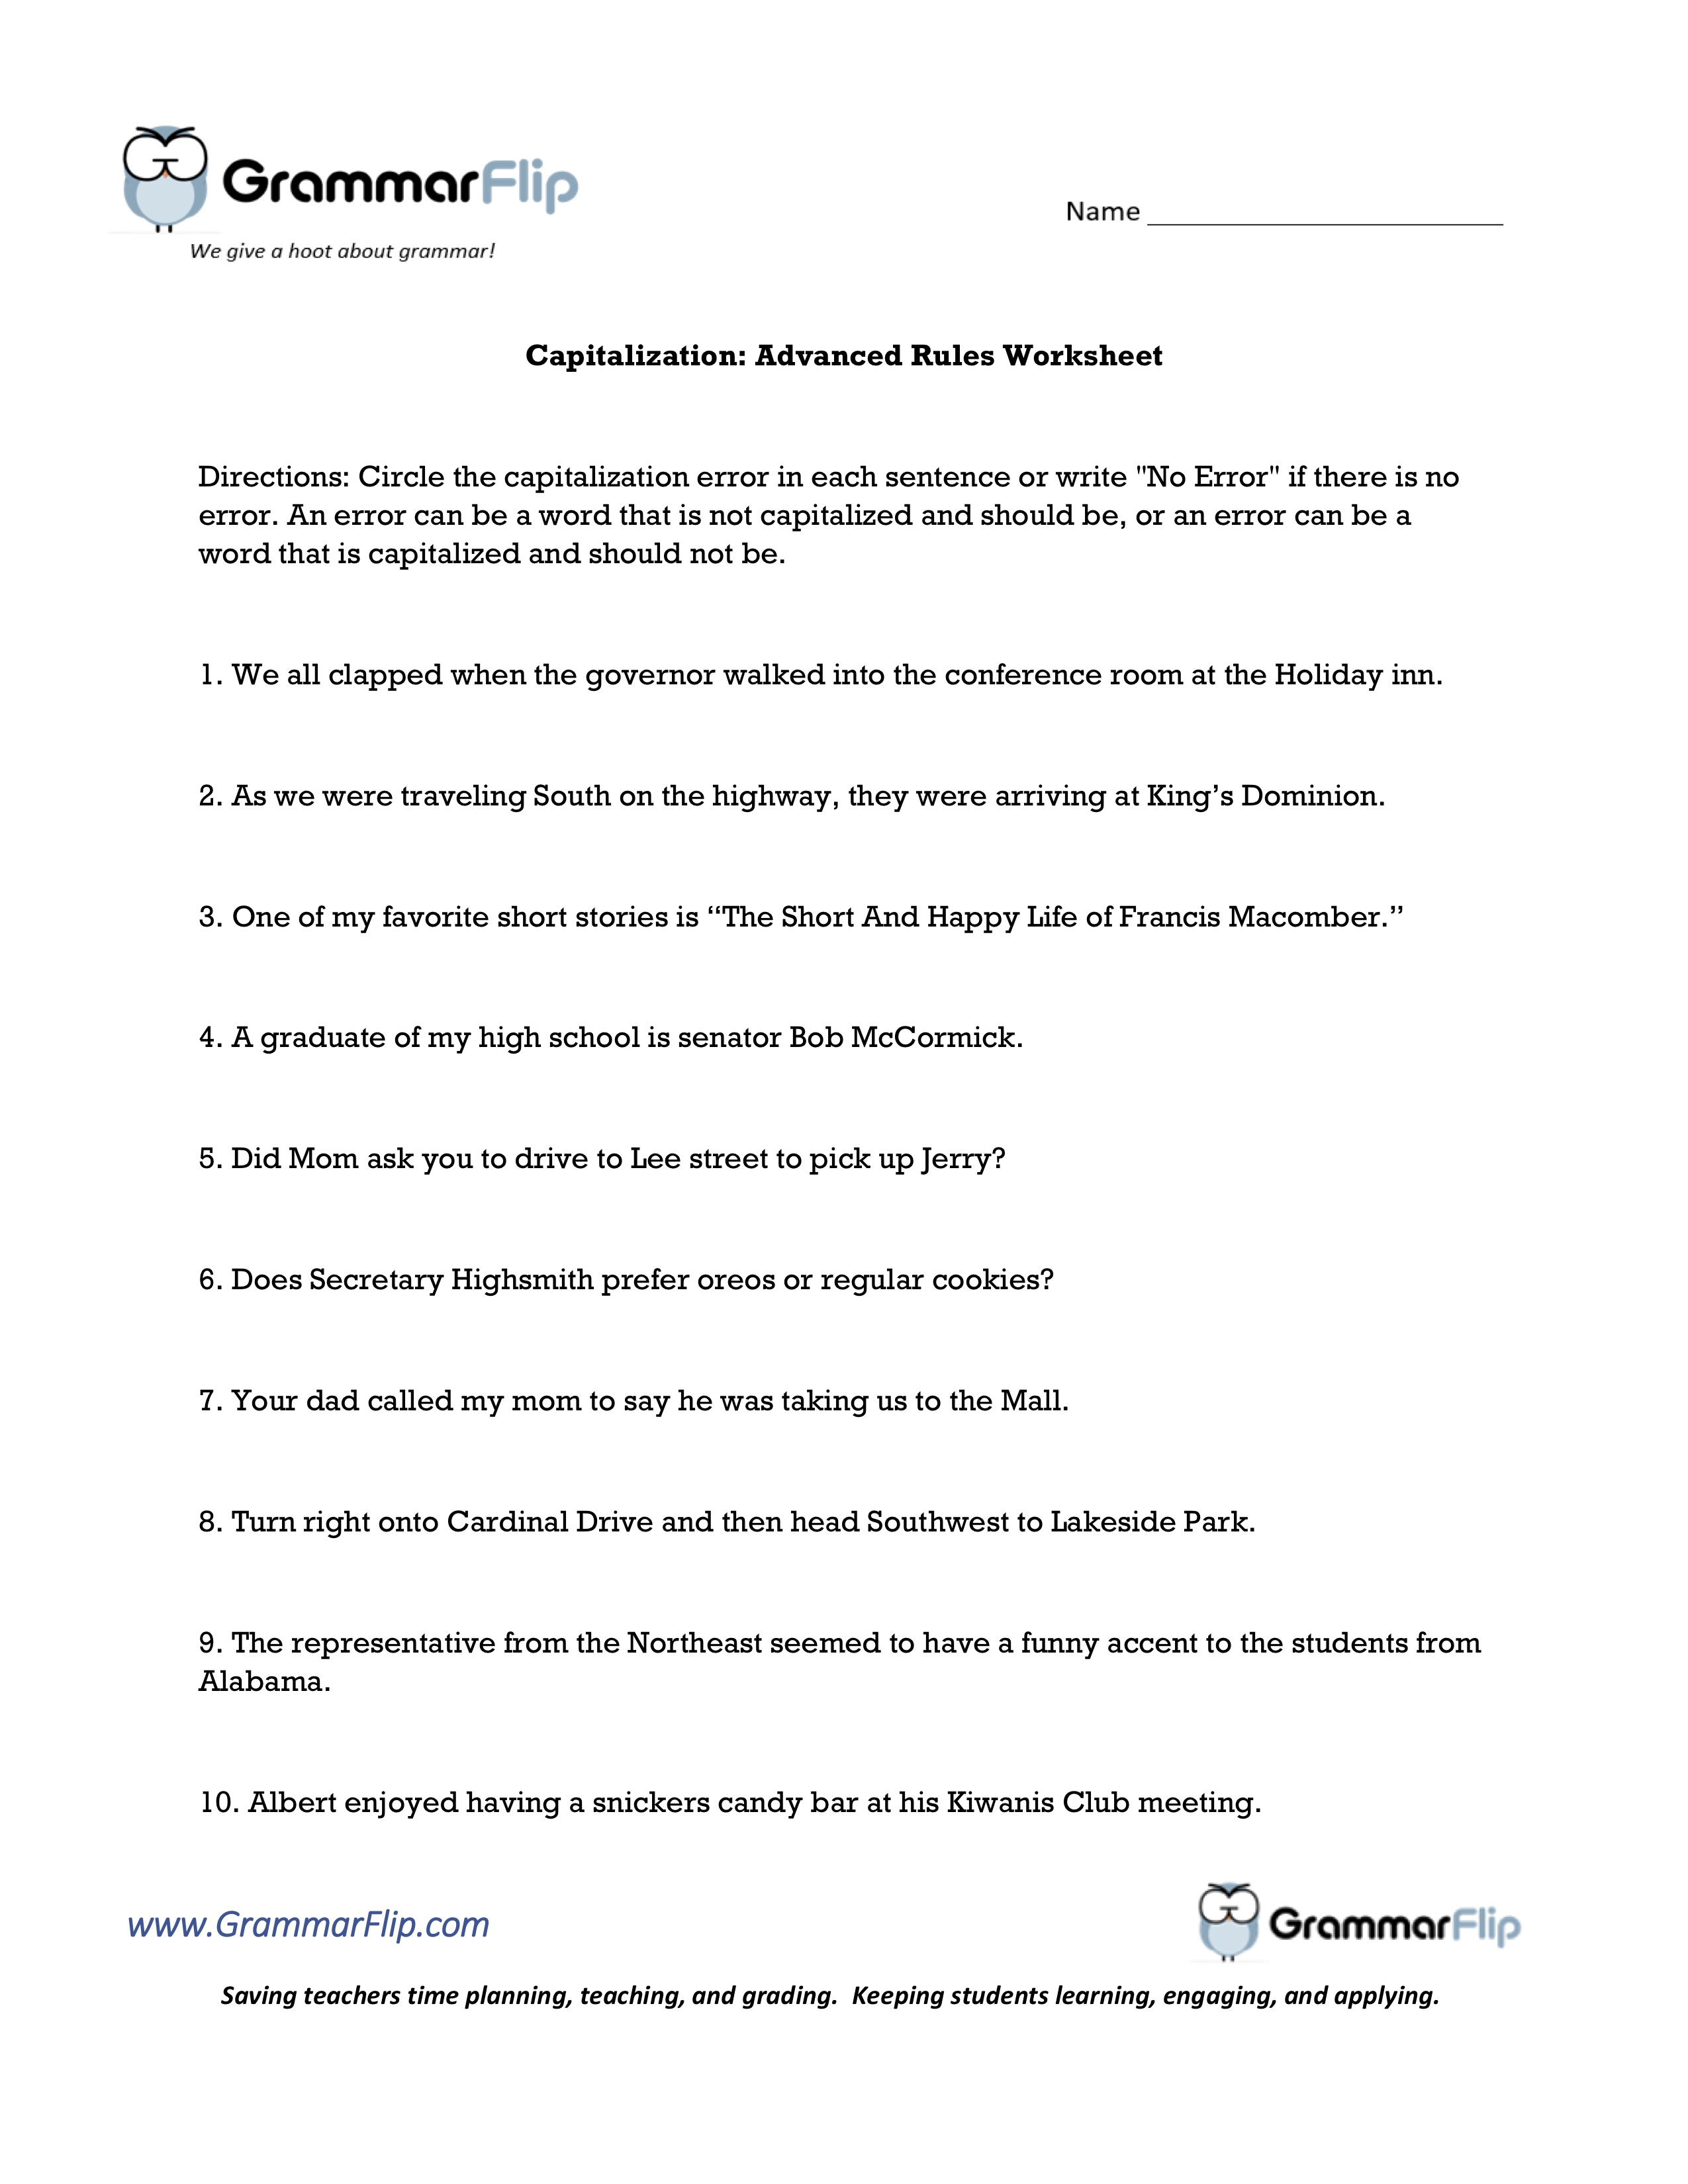 Capitalization Advanced Rules